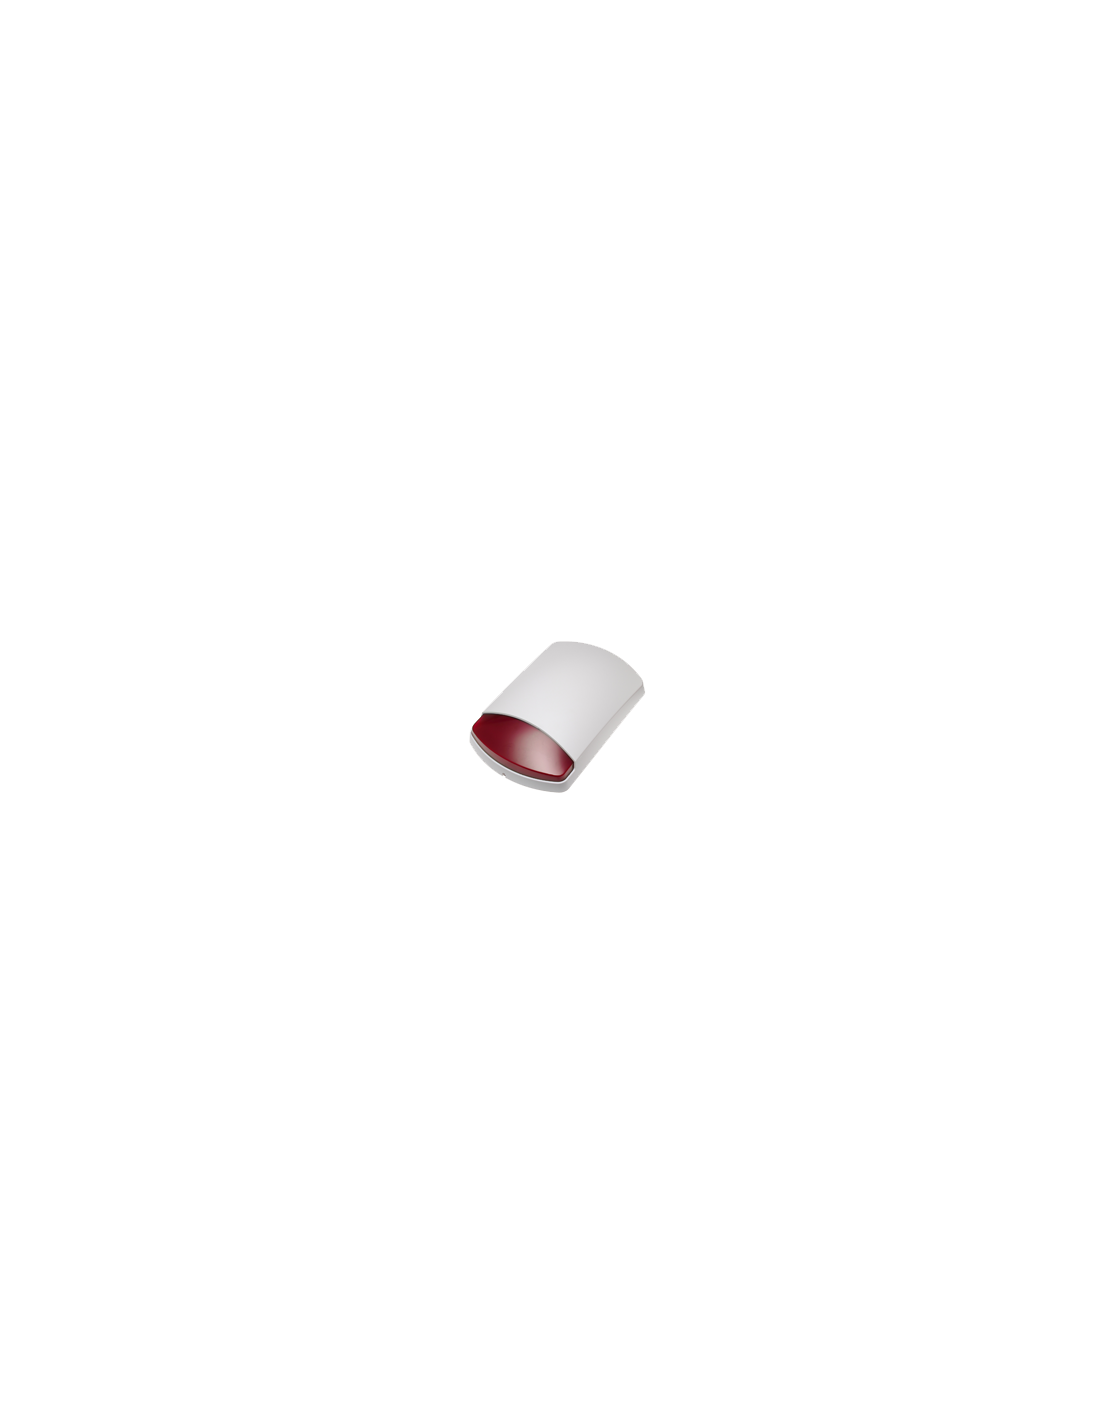 lupusec xt2 plus starter pack gross f r gewerbe und. Black Bedroom Furniture Sets. Home Design Ideas